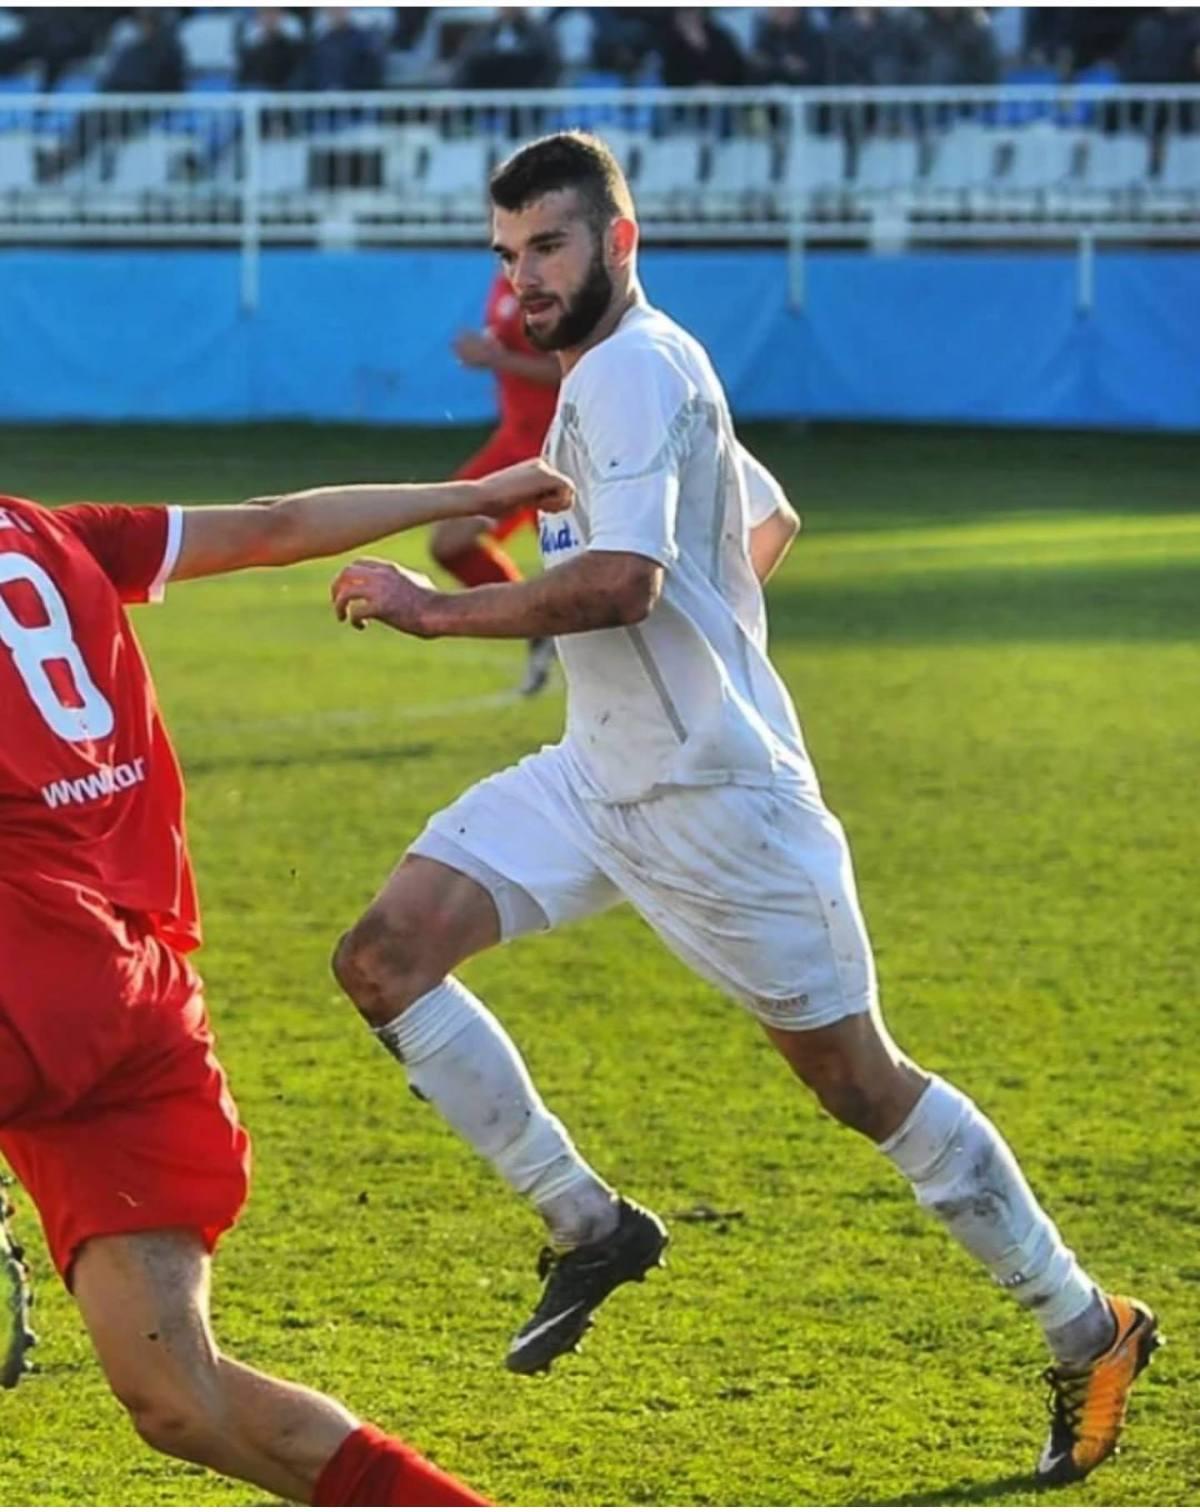 Iz HNK Primorca ravno u prvu ligu: Nikola Marić novi igrač bugarskog prvoligaša